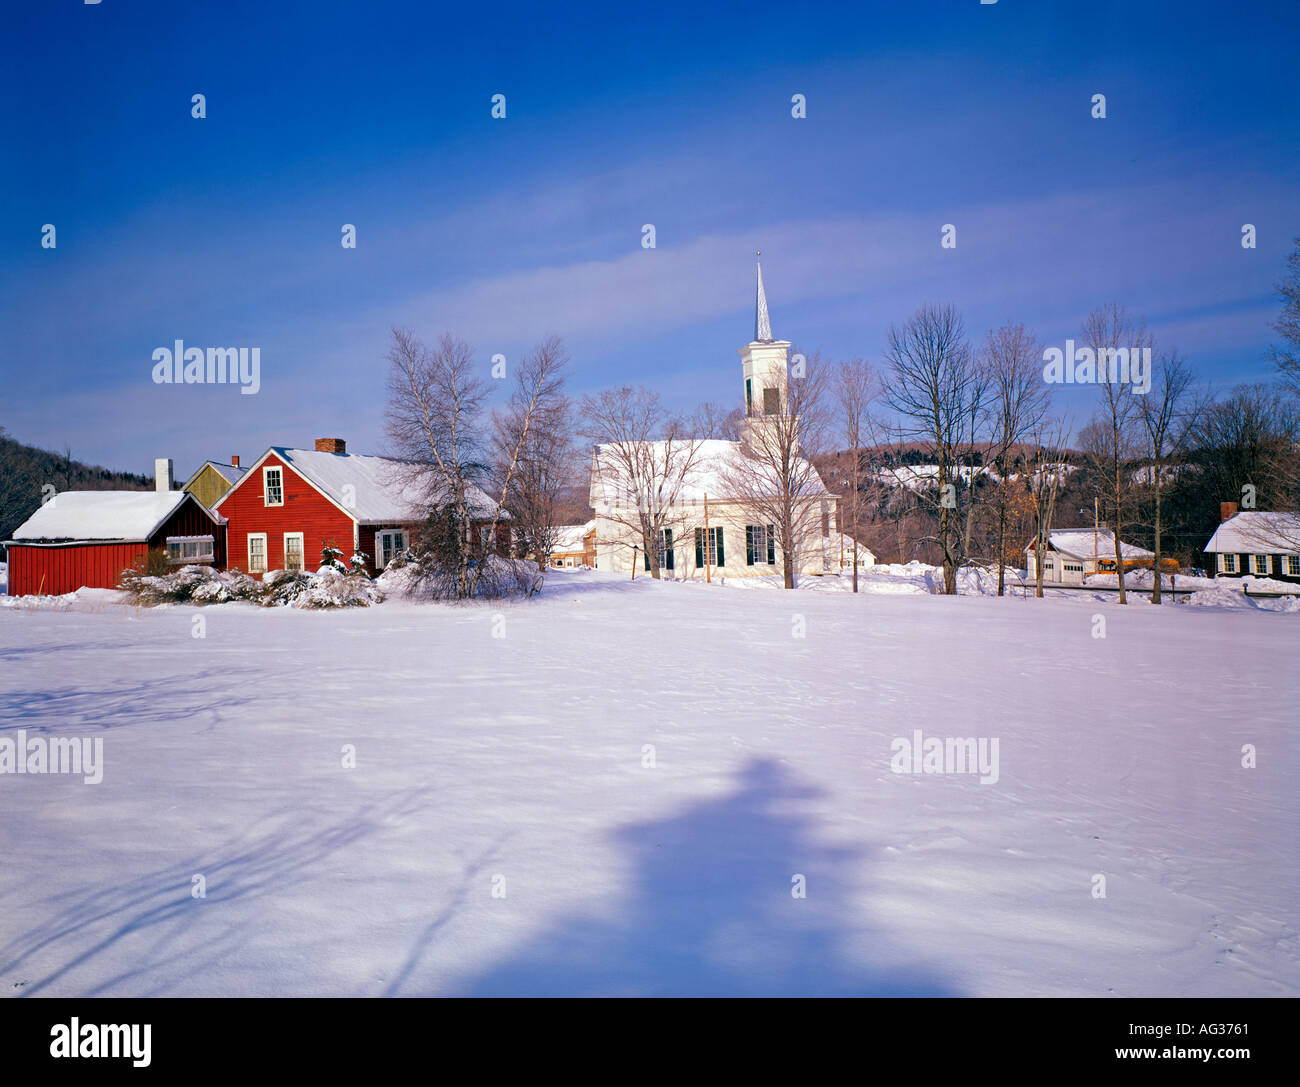 village of Barnard Vermont USA in winter - Stock Image